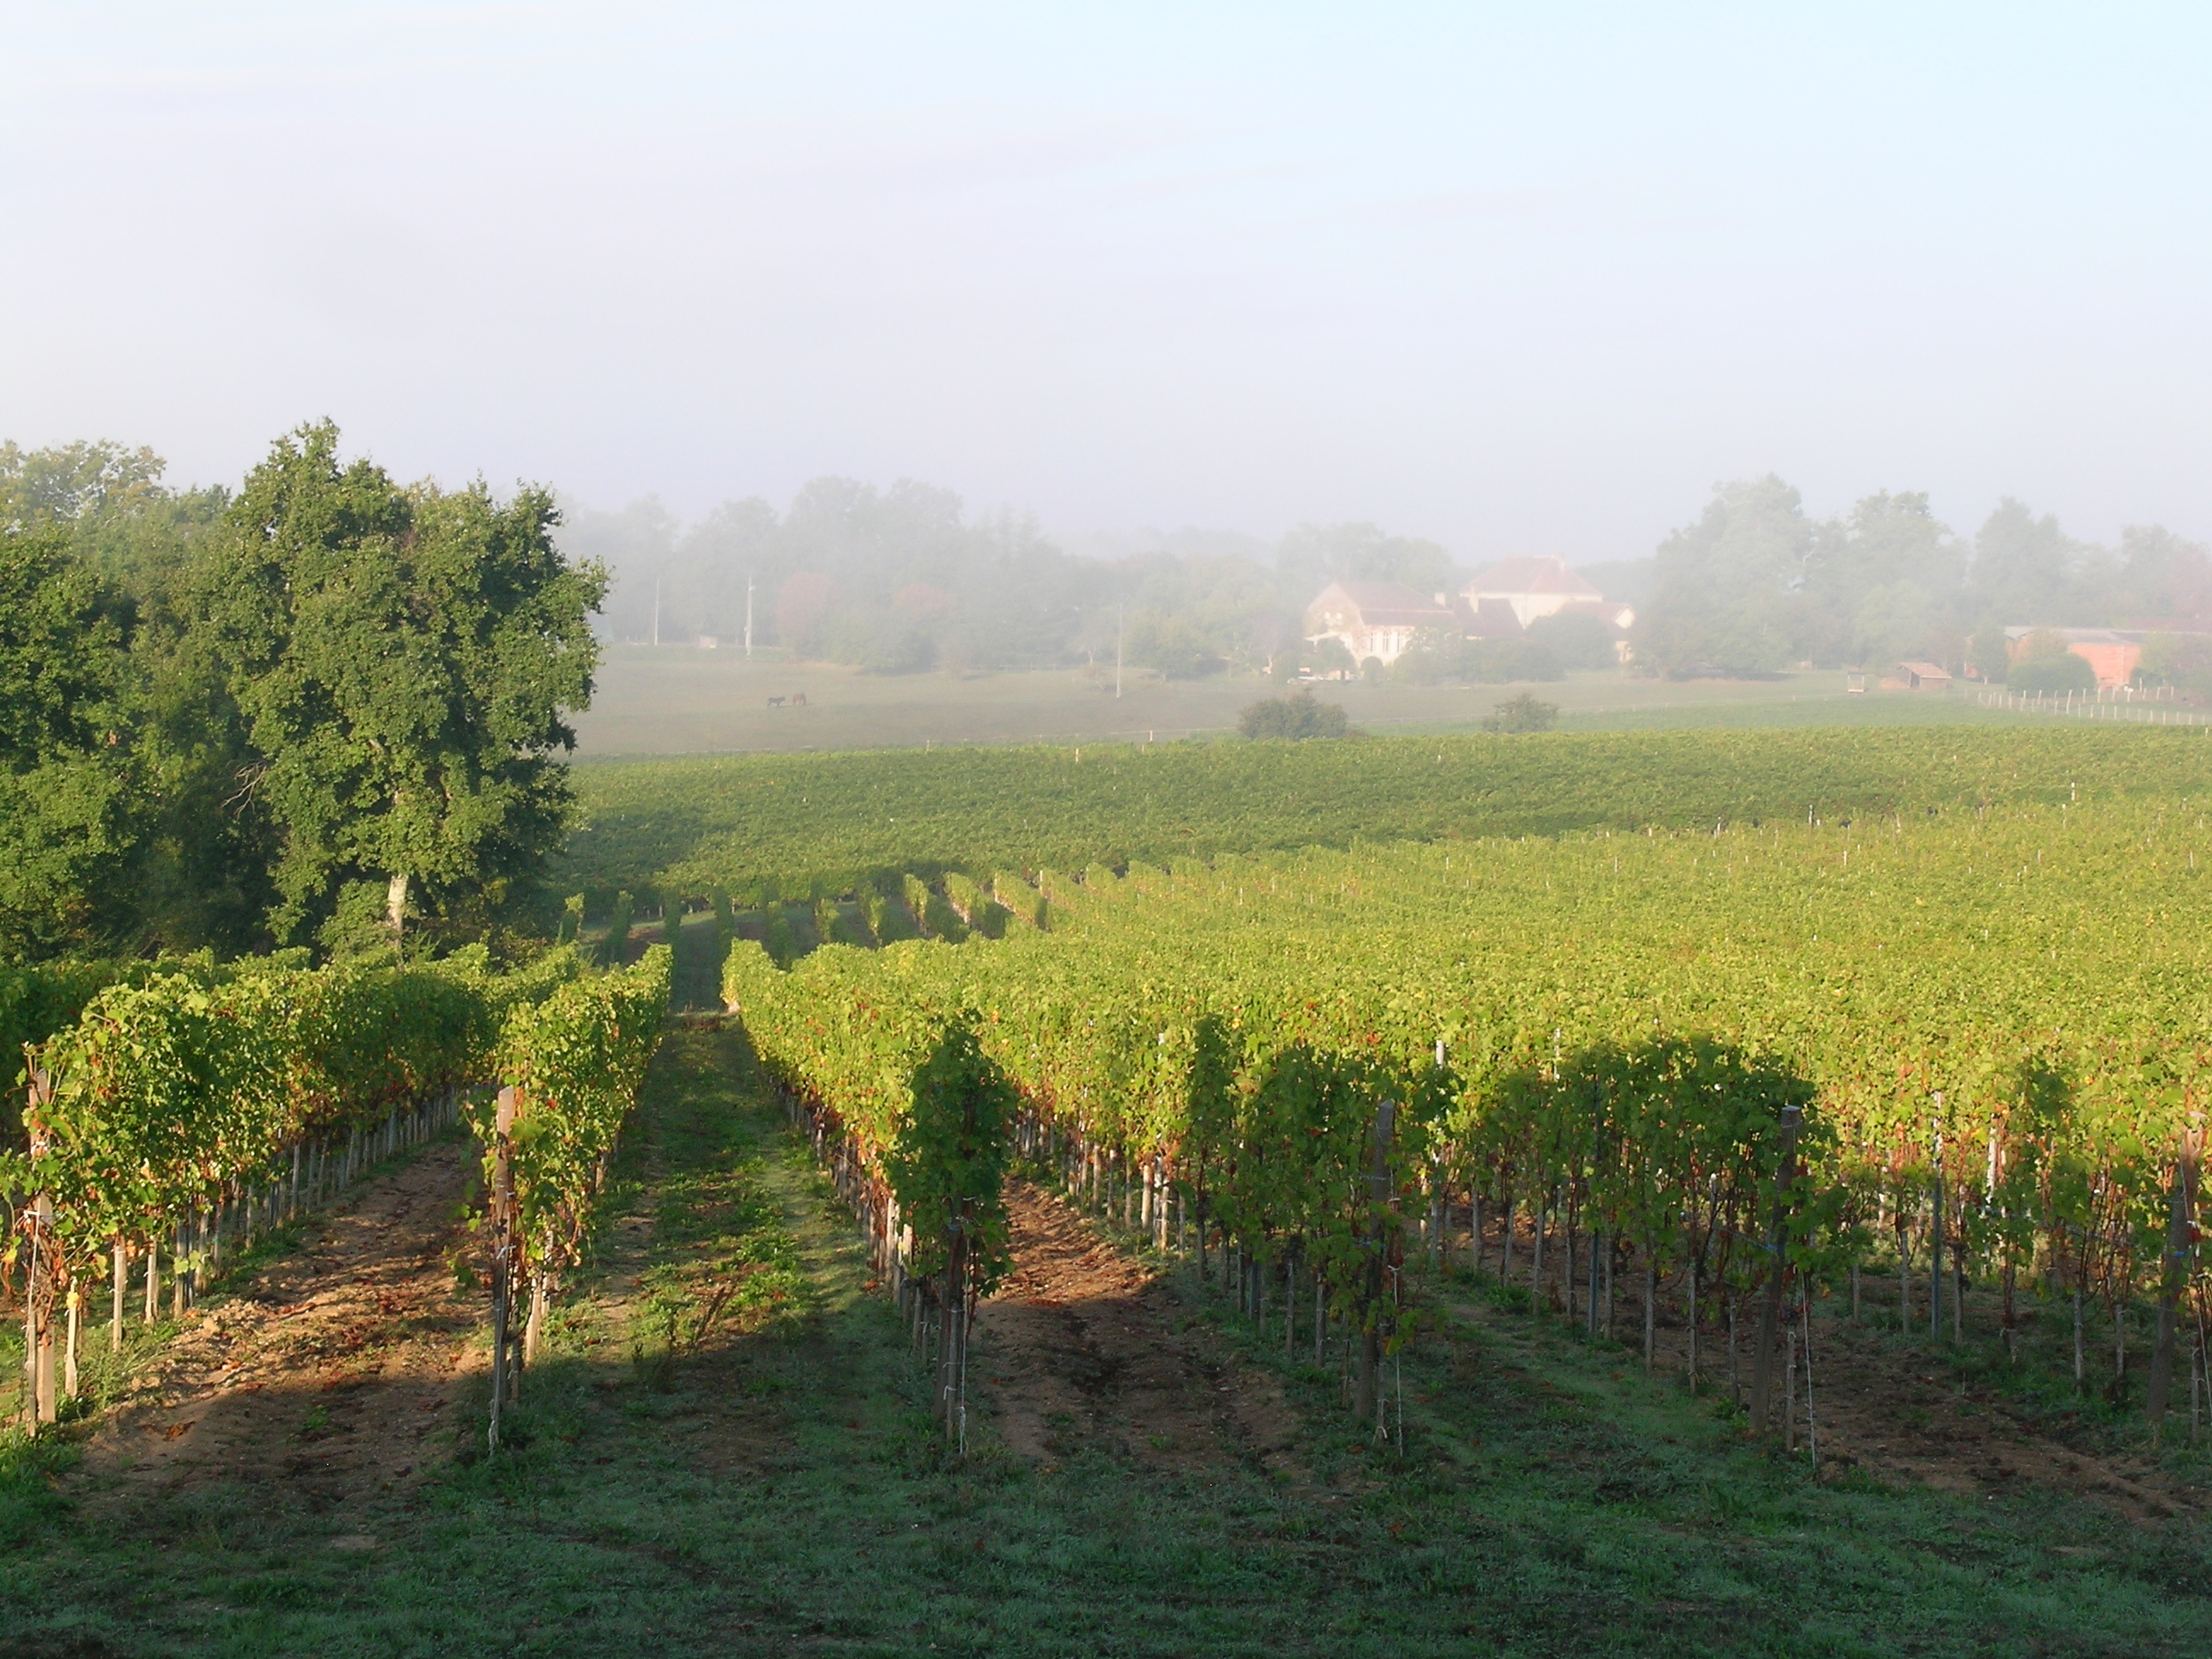 Chambre d'hôtes - Bed & Breakfast - Bergerac - vignoble